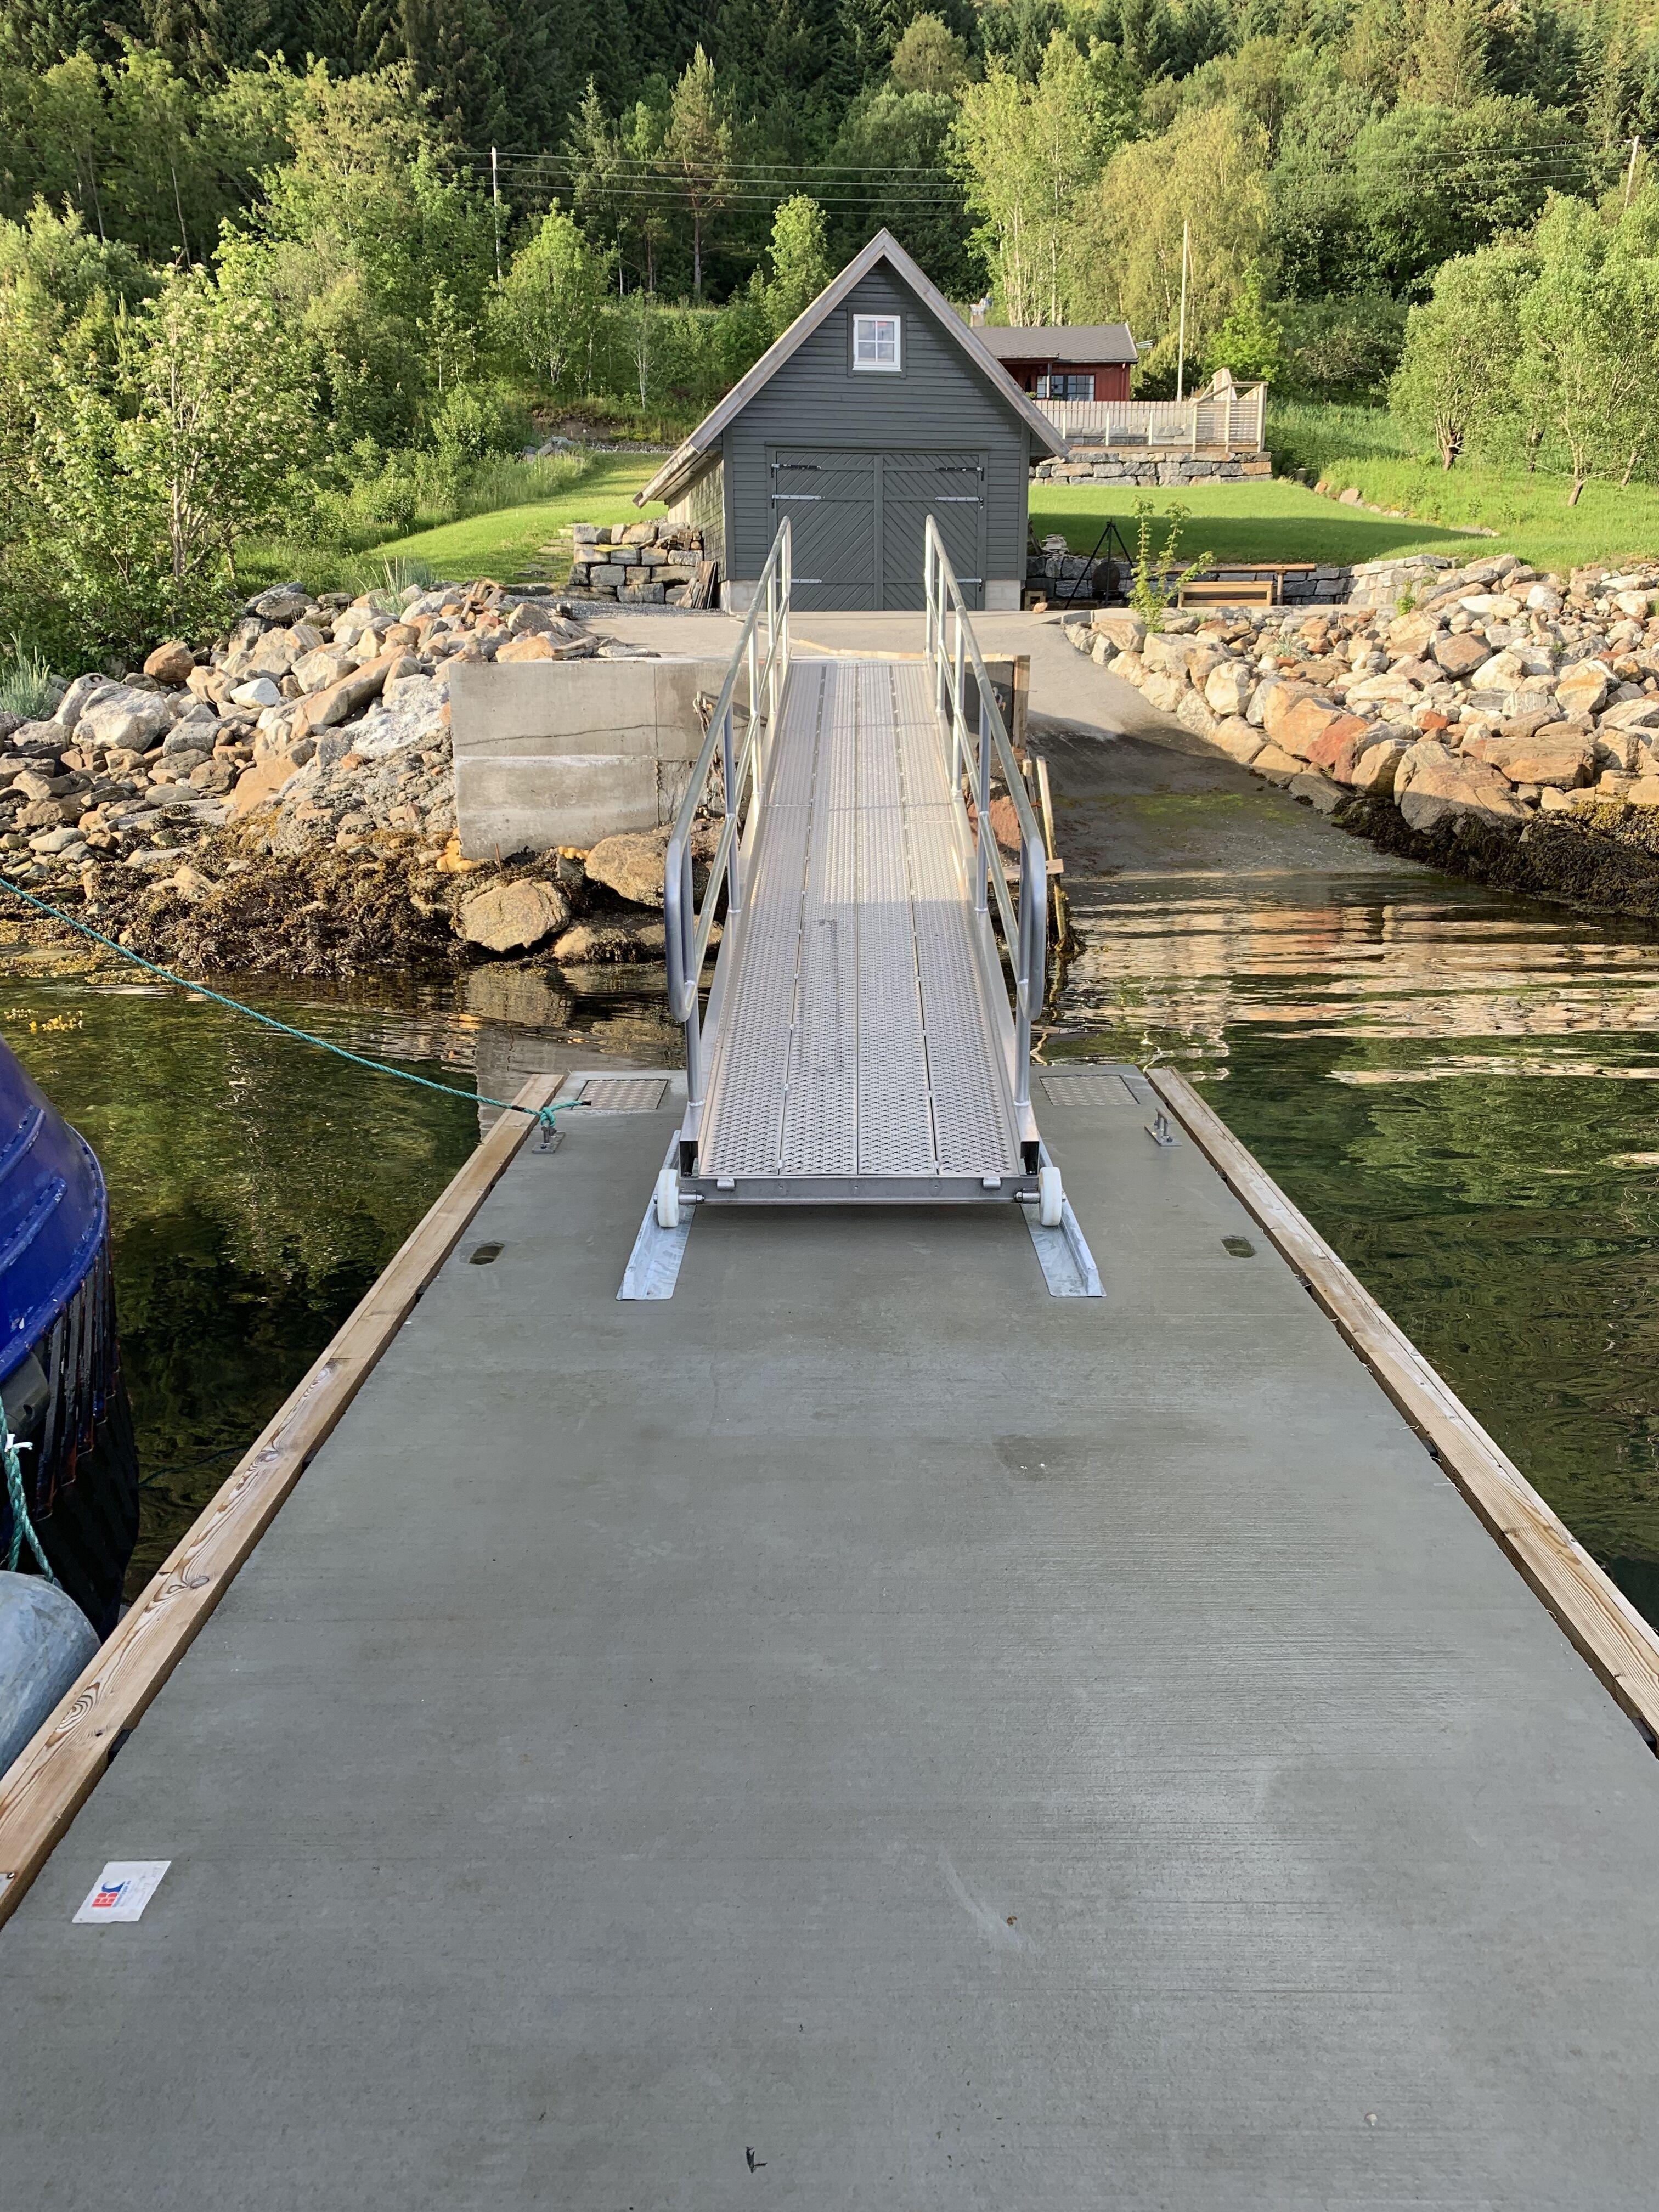 https://marinasolutions.no/uploads/Haugsbygda-Gursken-Larsnes-landstedsbrygge-Marina-Ocean-2.jpeg